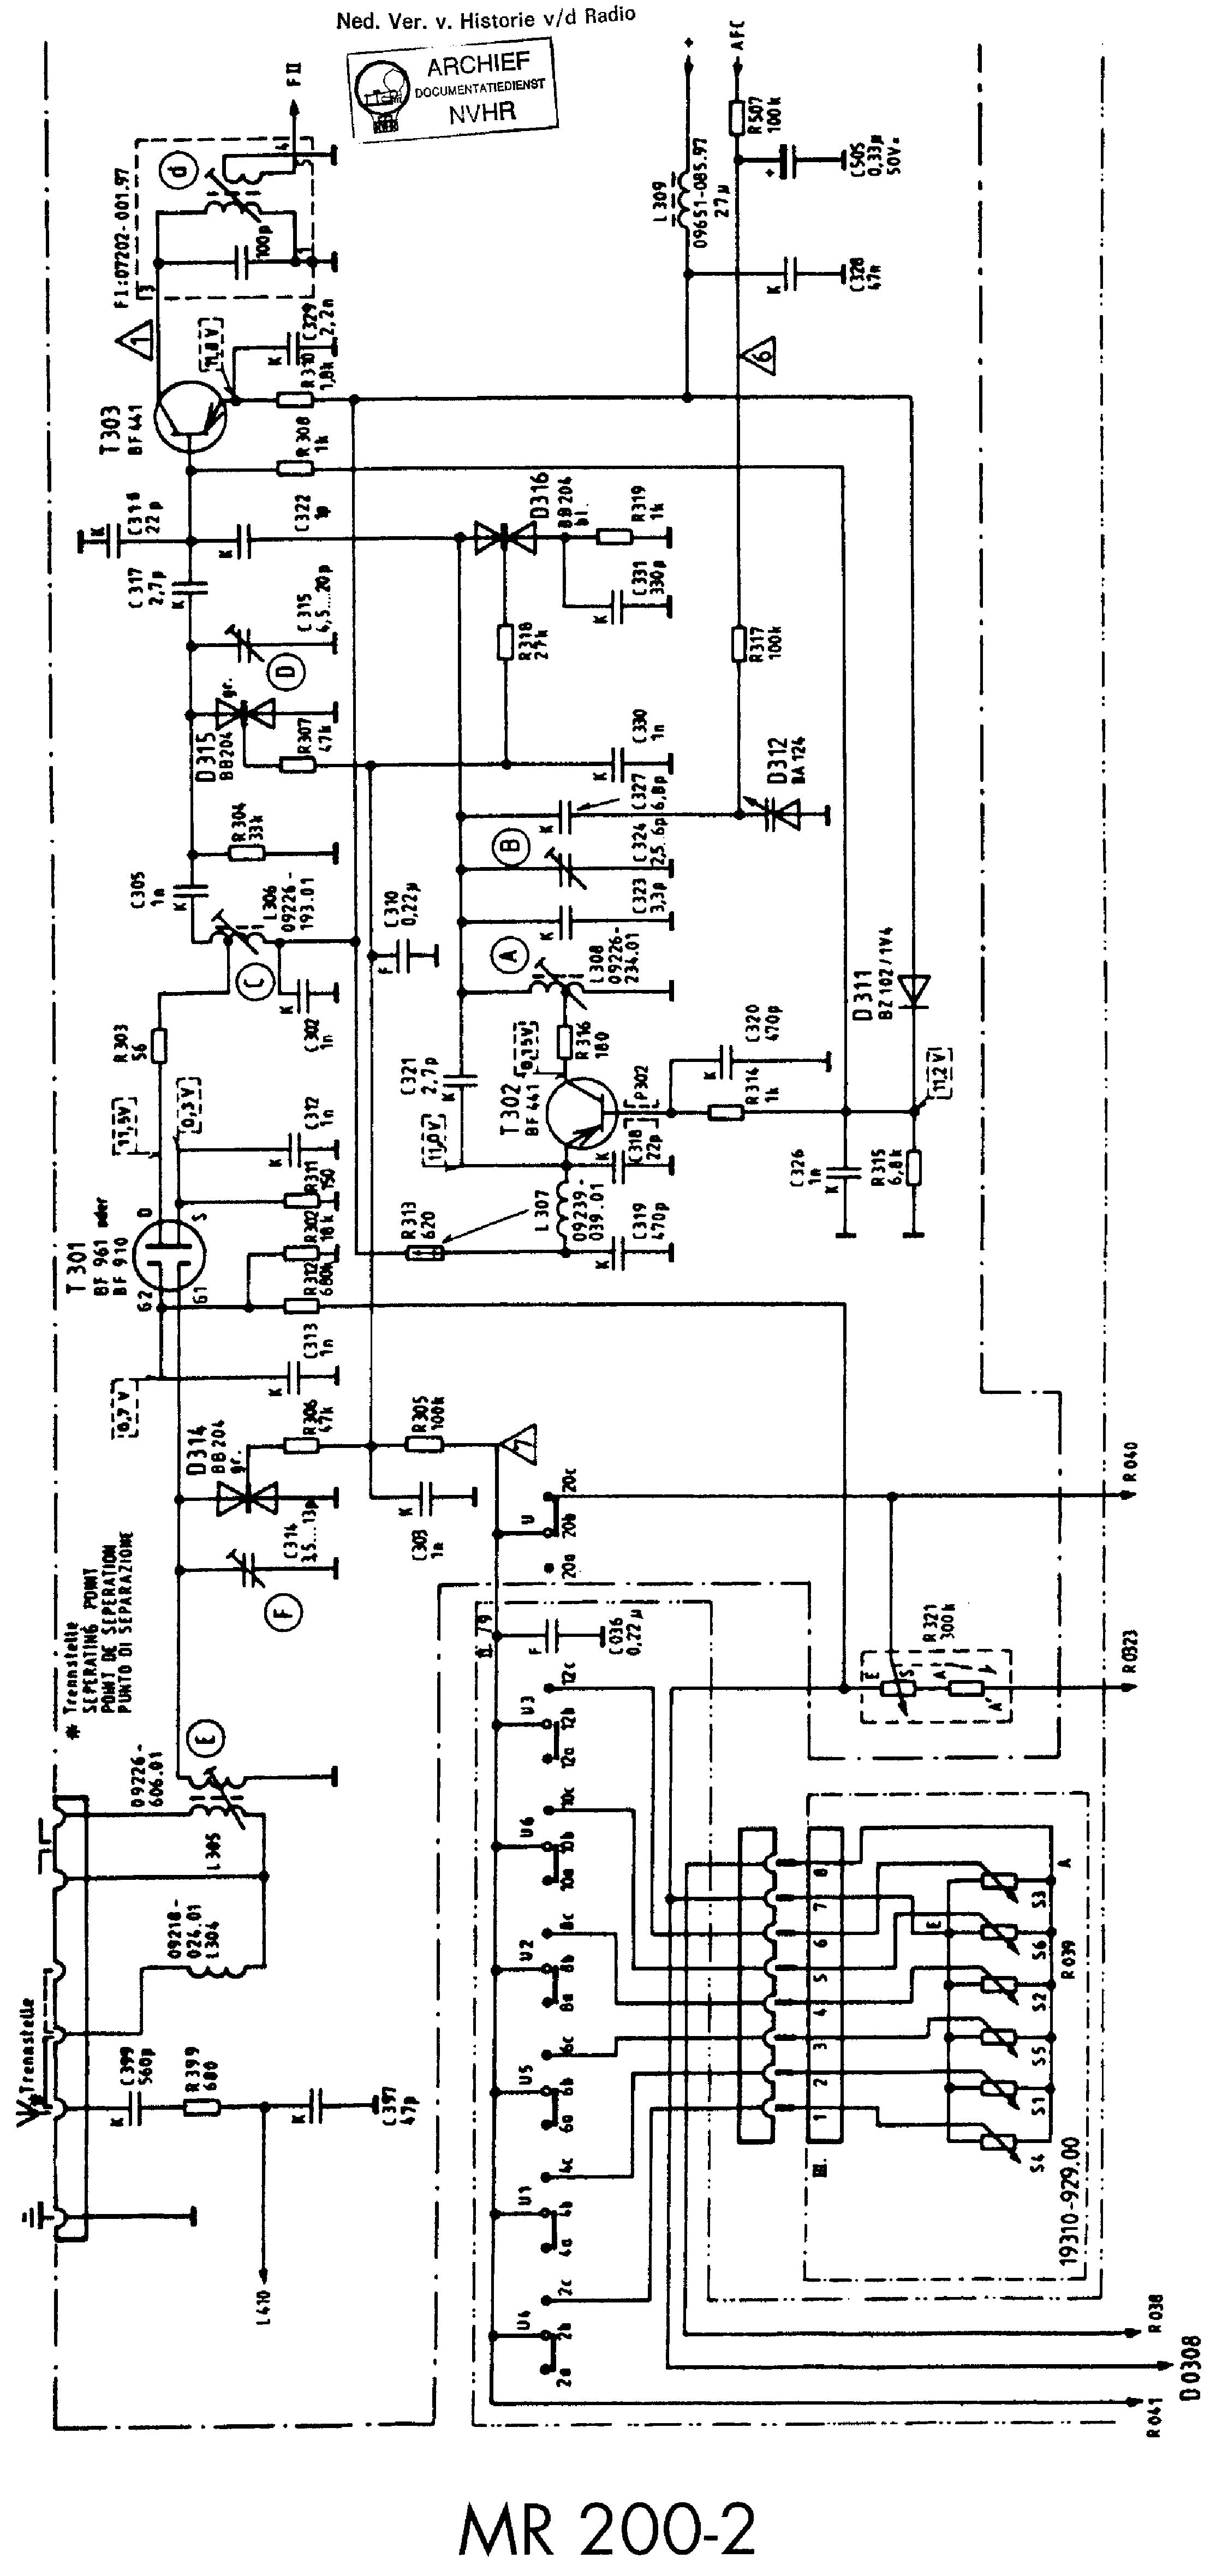 Grundig V4200 Service Manual Free Download Schematics